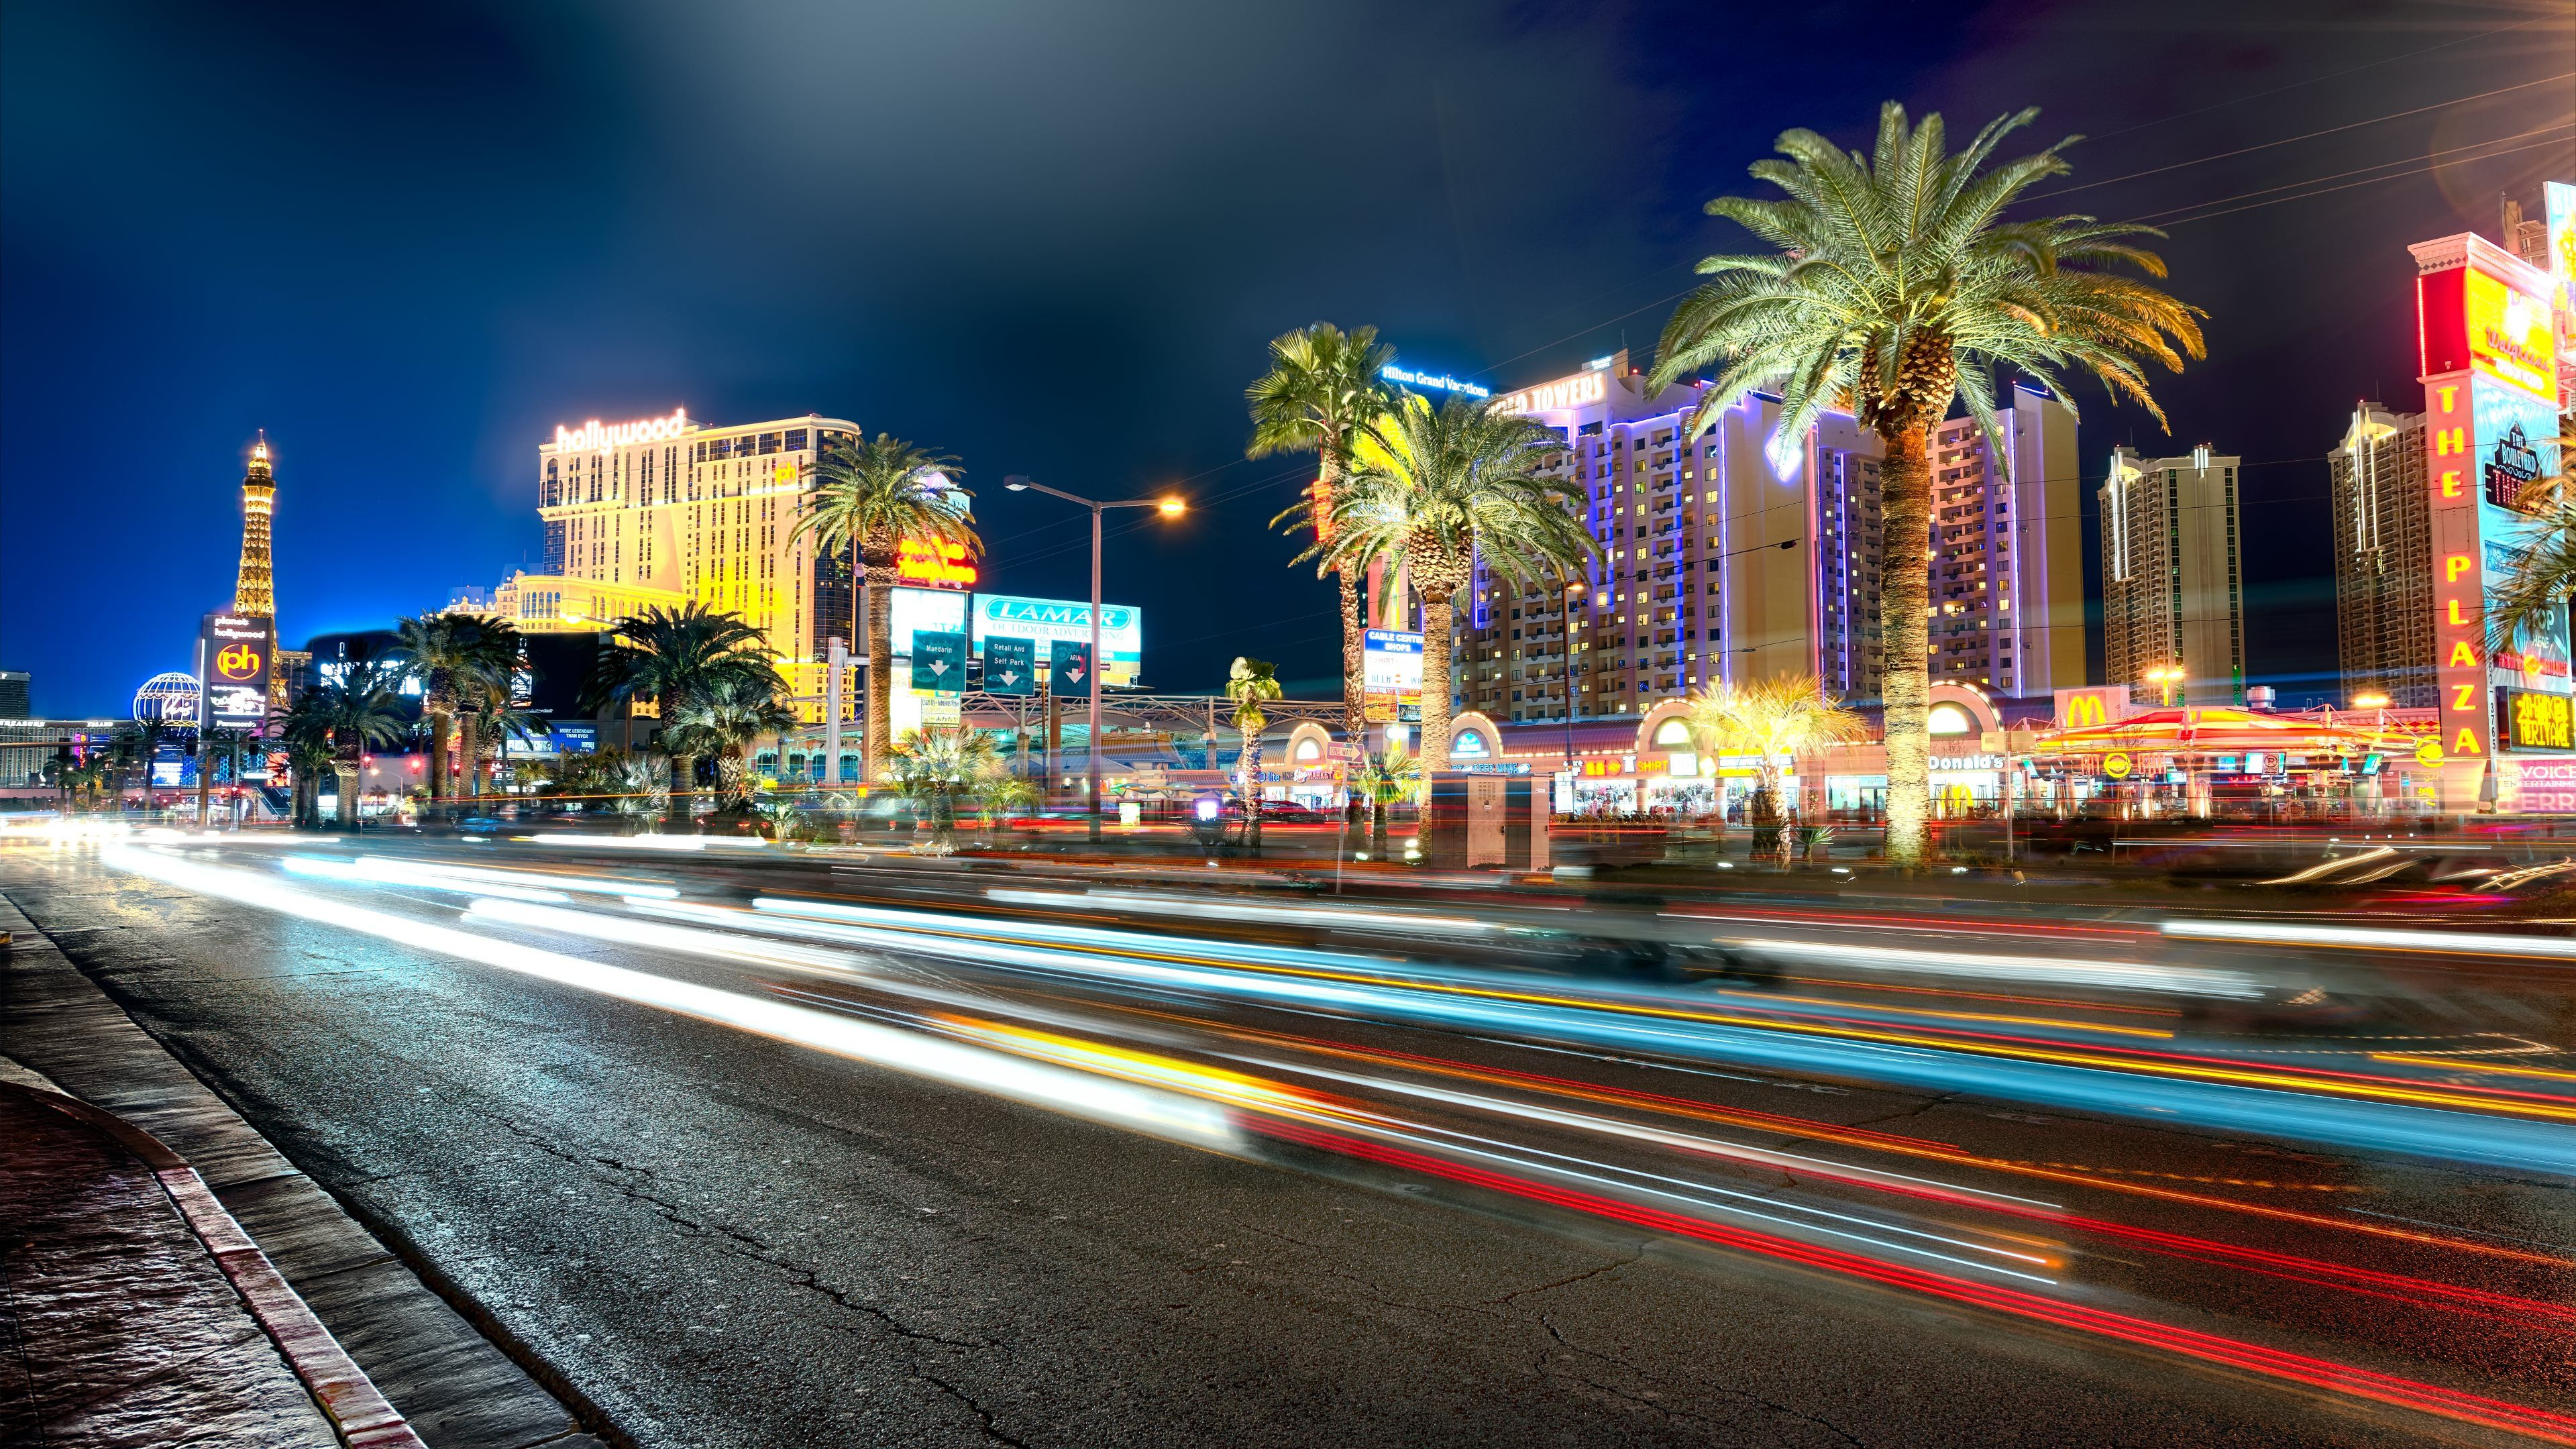 Vegas 4k Wallpapers Top Free Vegas 4k Backgrounds